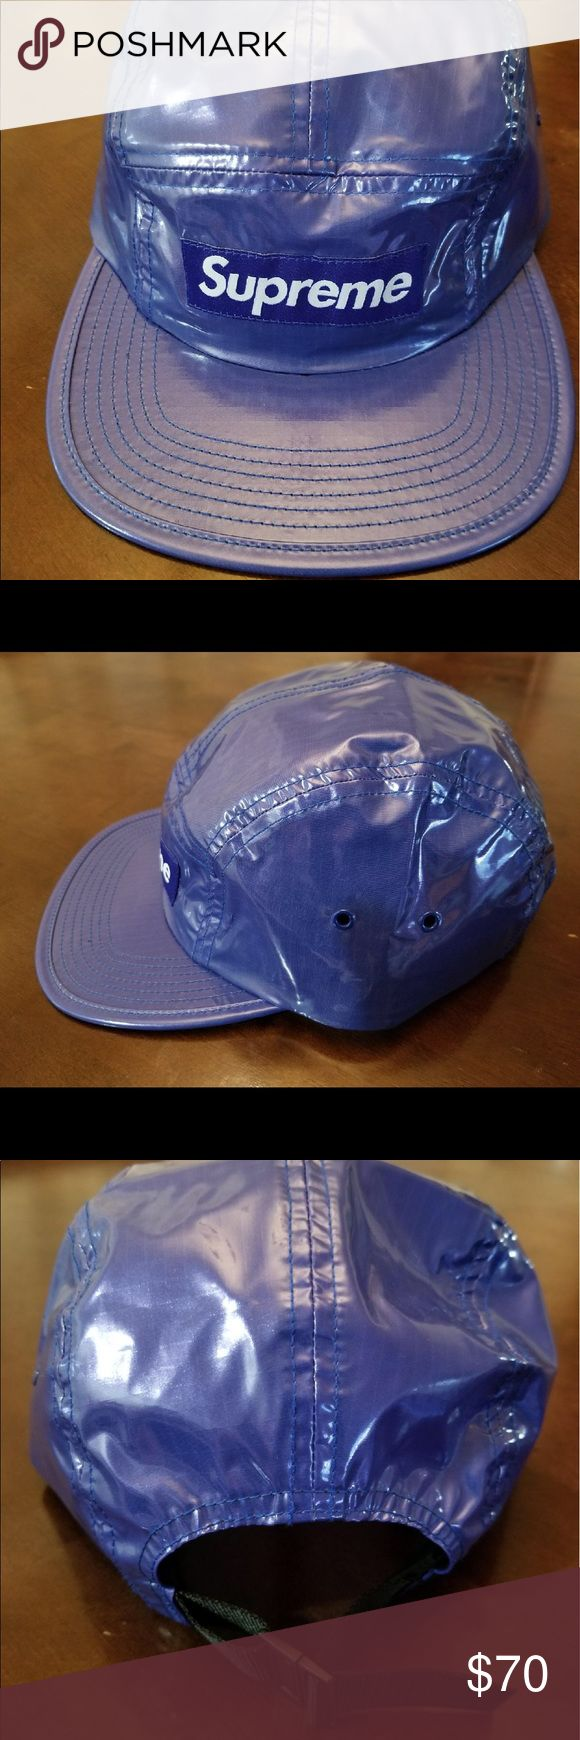 Supreme 5 Panel Hat 10/10 condition.  Bought from the Supreme store in LA. Supreme Accessories Hats